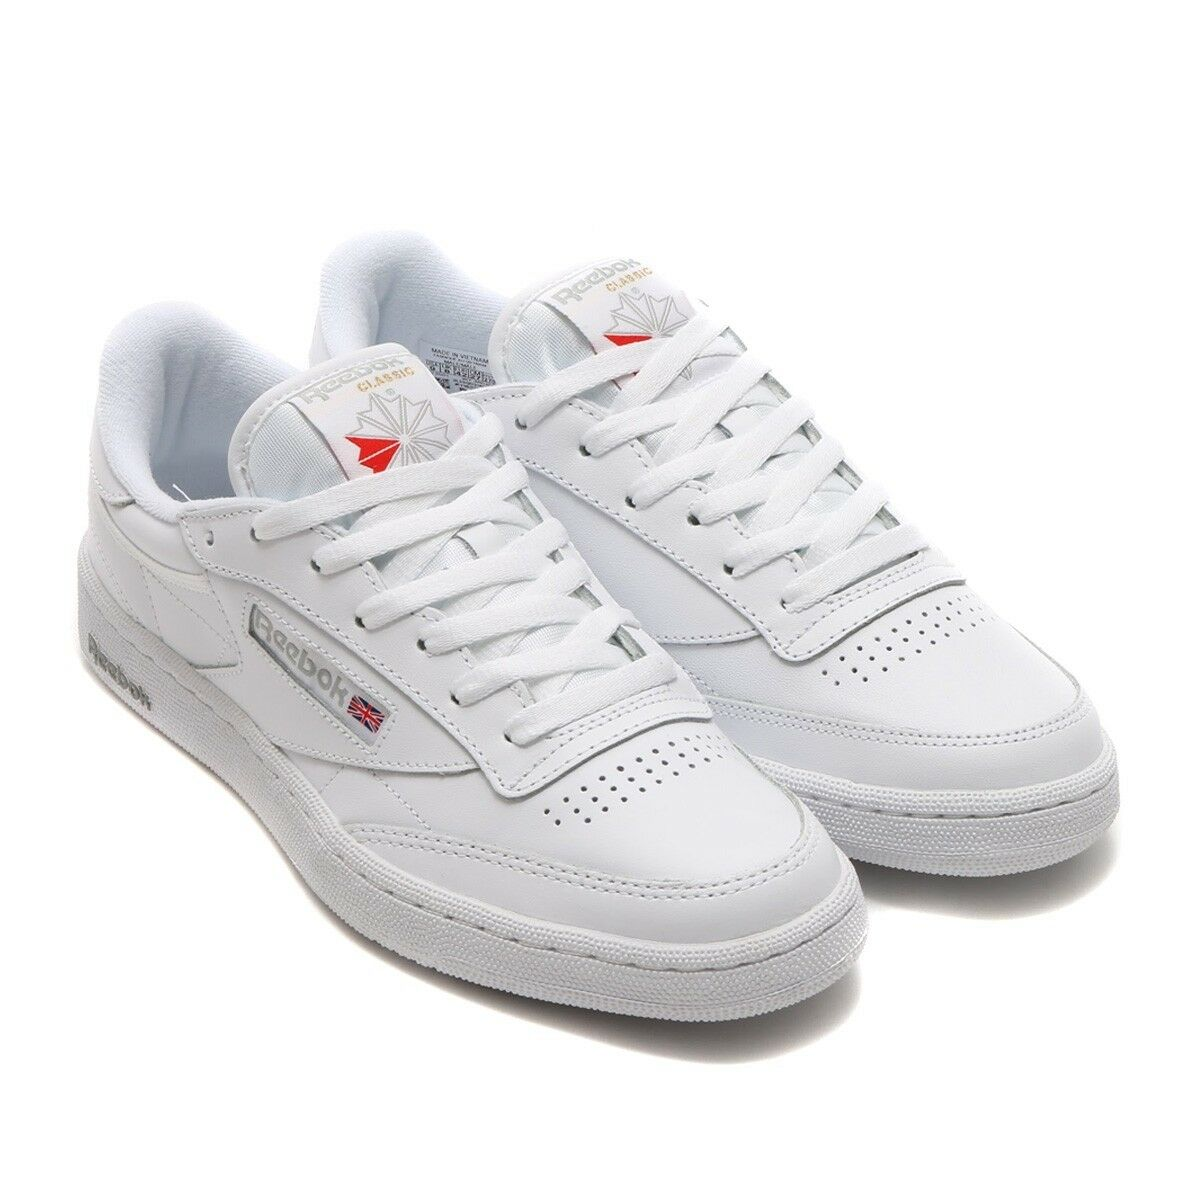 Reebok AR0455  Hombres Club 85 Moda Internacional-blancoo C gris Transparente tenis